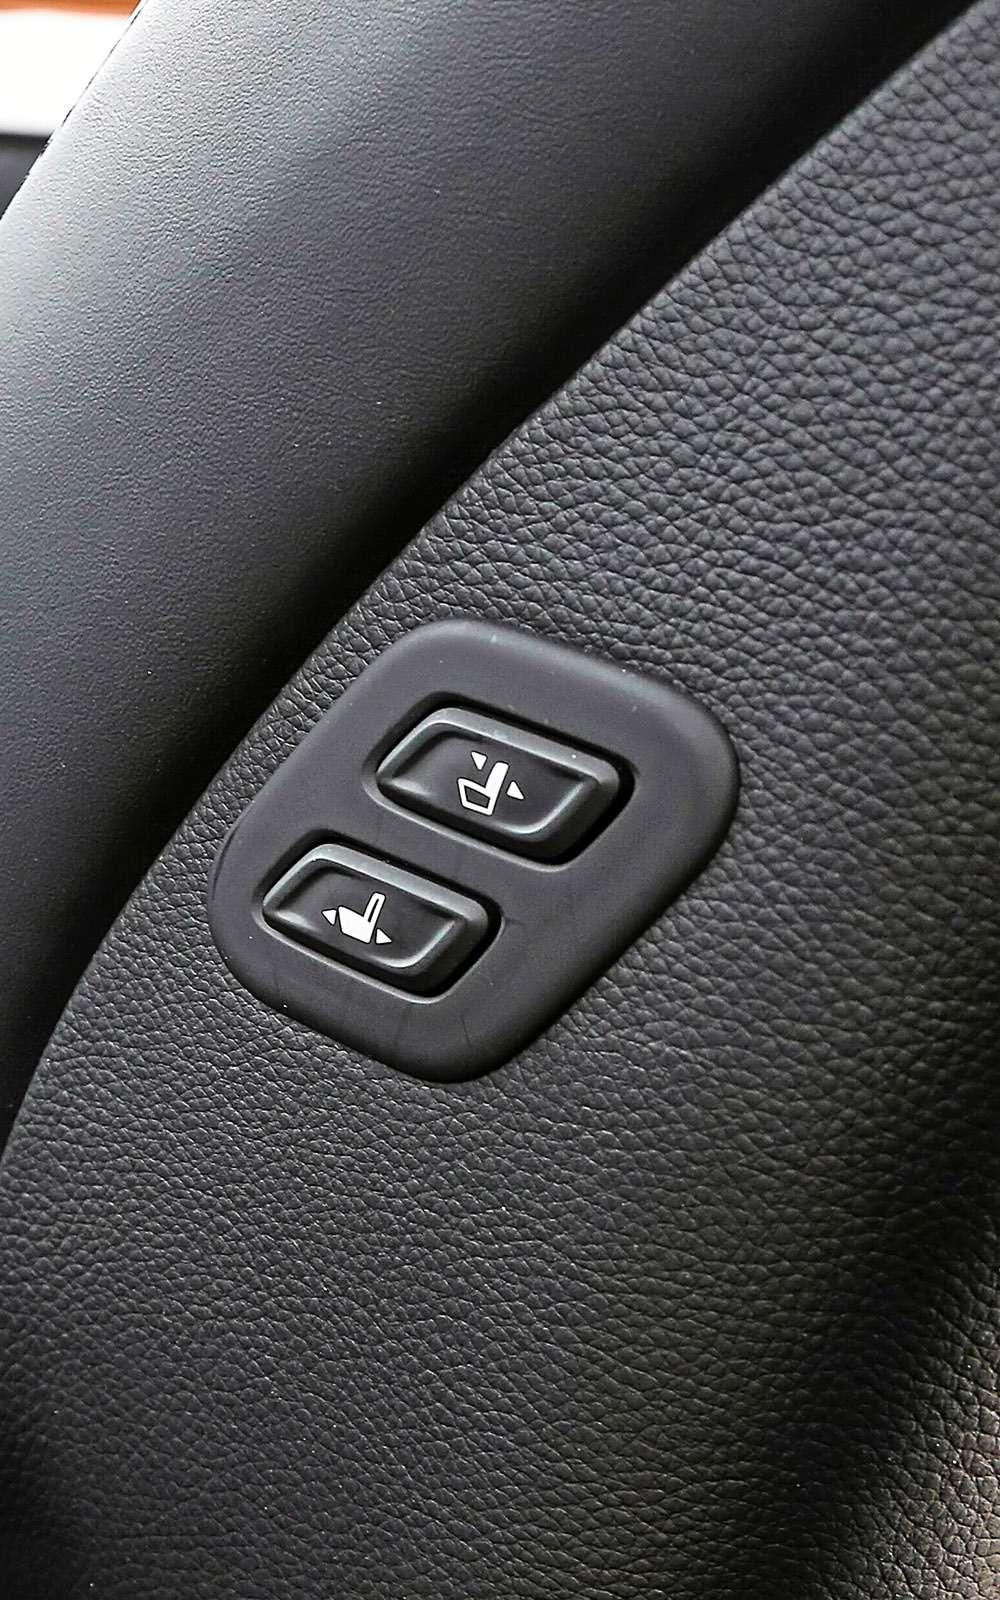 Mitsubishi Pajero Sport иKia Mohave— сравнительный тест настоящих внедорожников— фото 769891